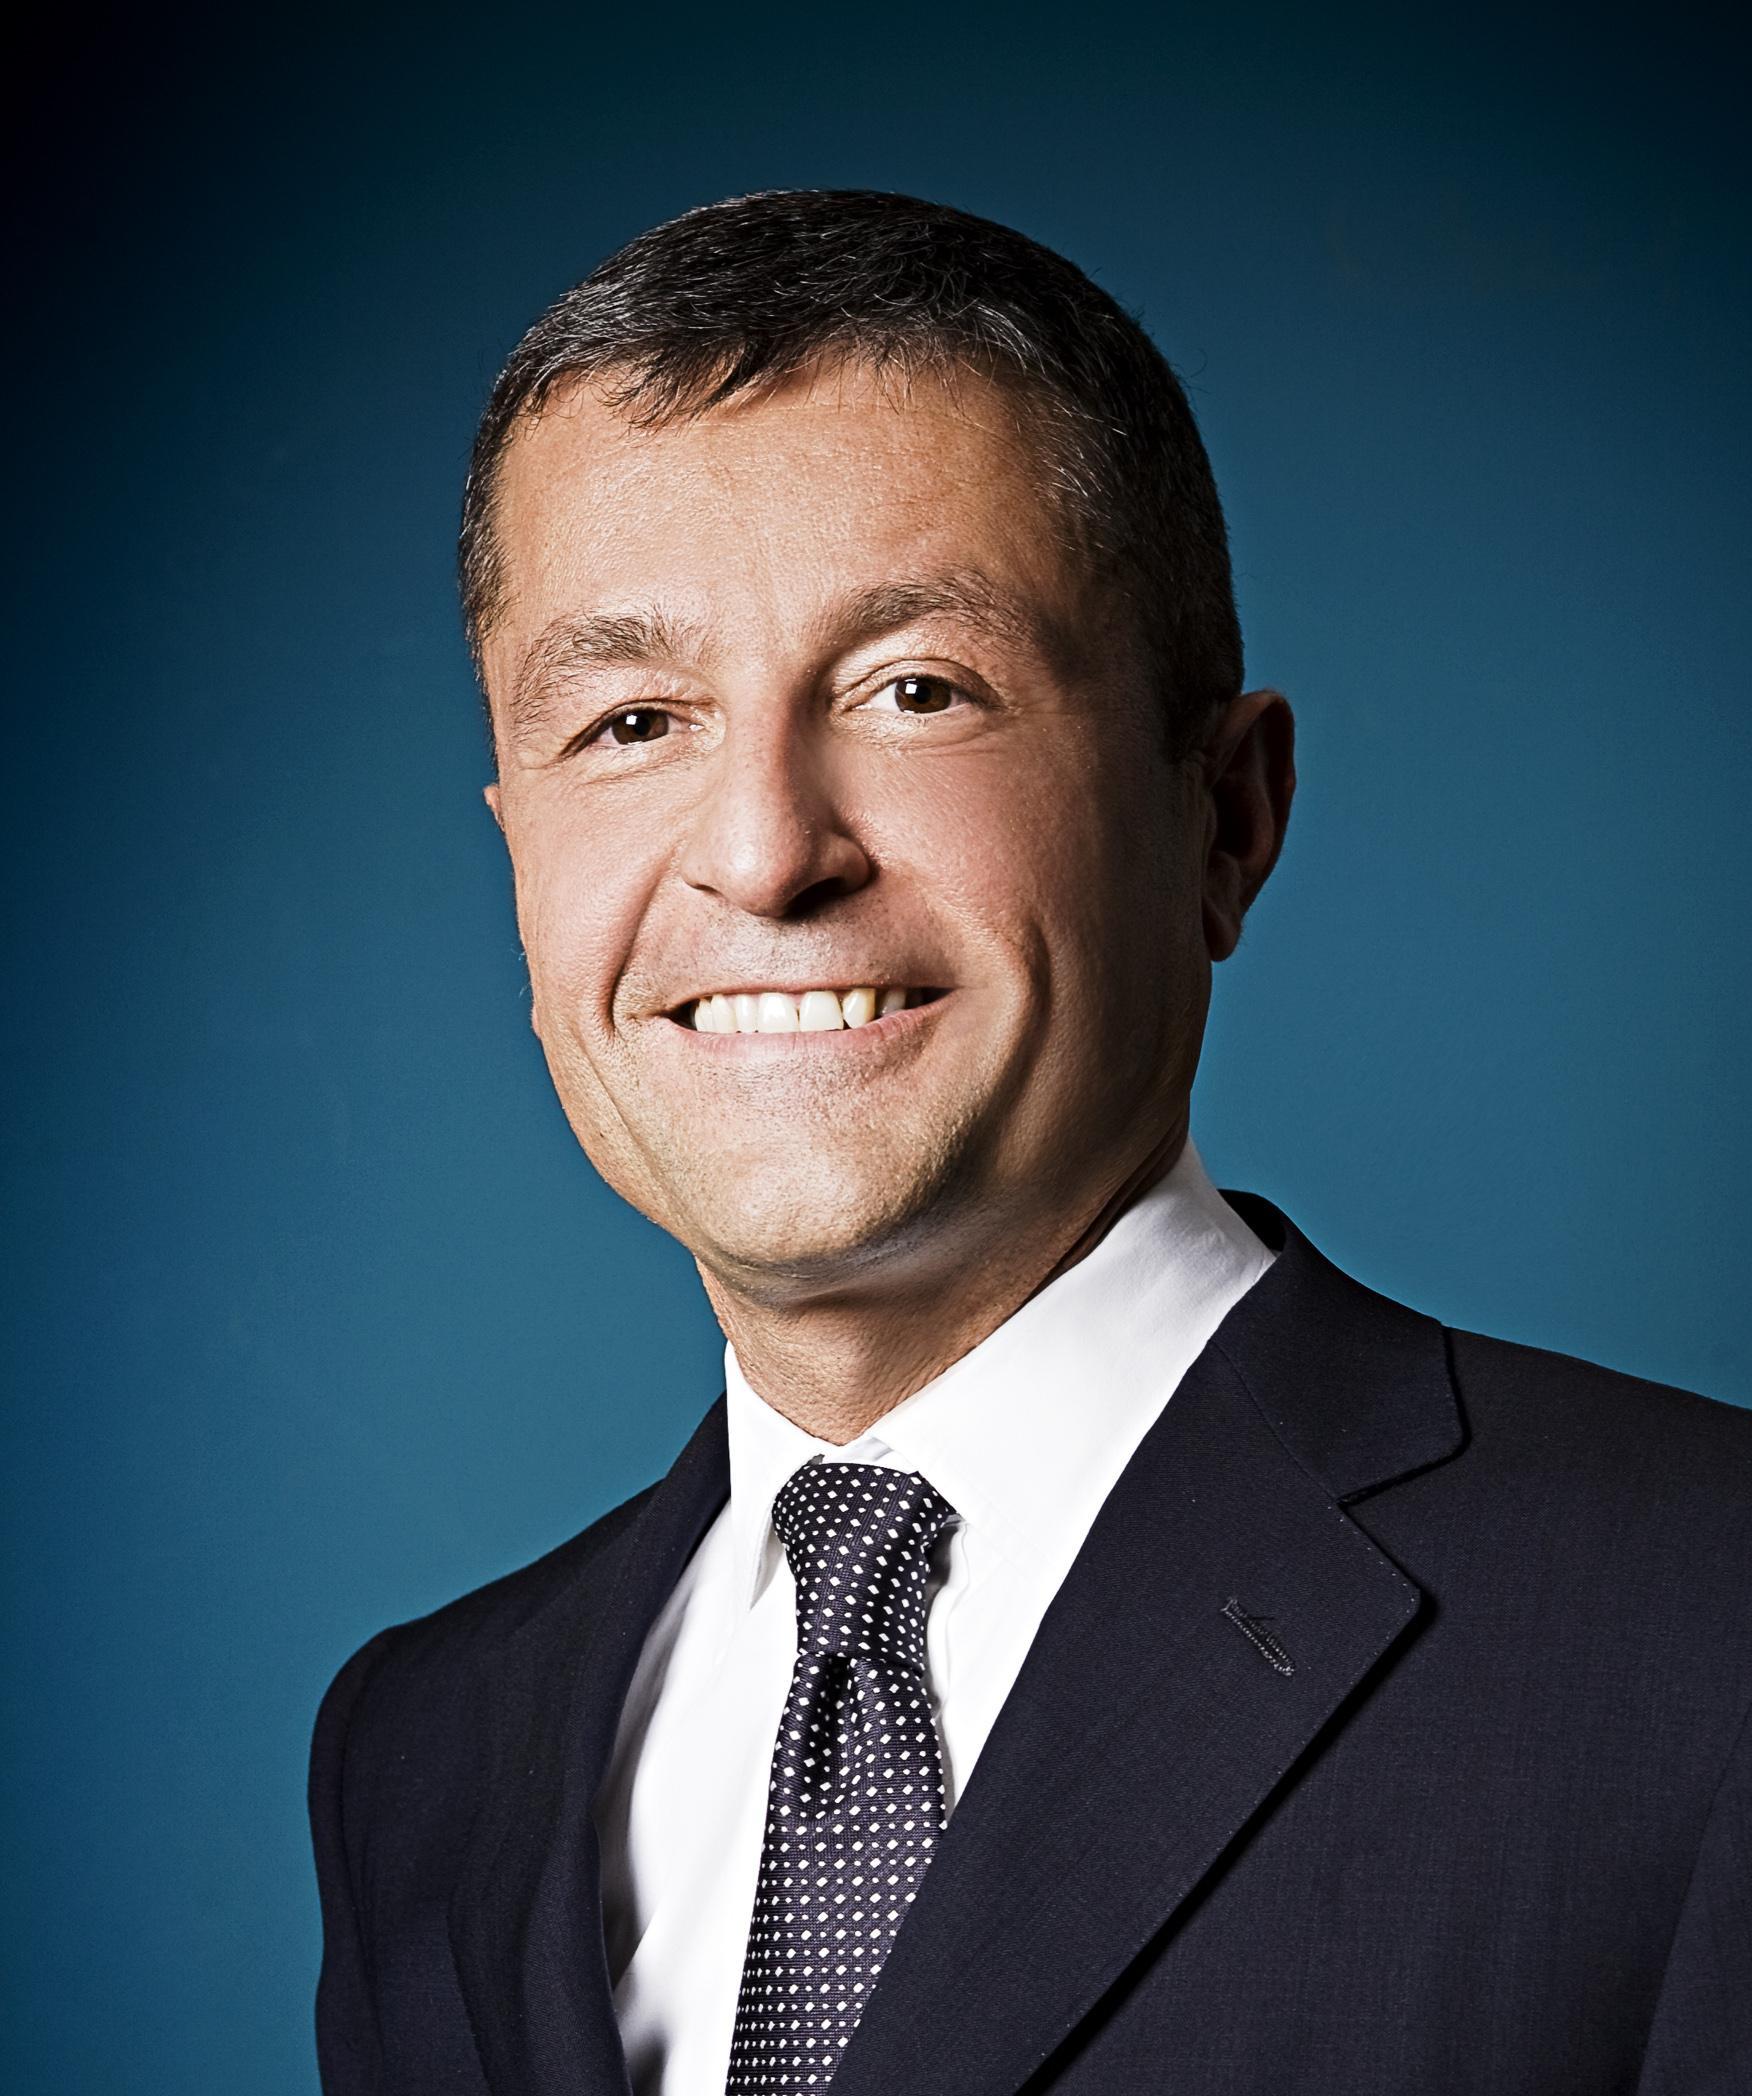 https://www.promotionmagazine.it/wp/wp-content/uploads/2013/07/Andrea-Cornelli-CEO-Ketchum-Italia.jpg